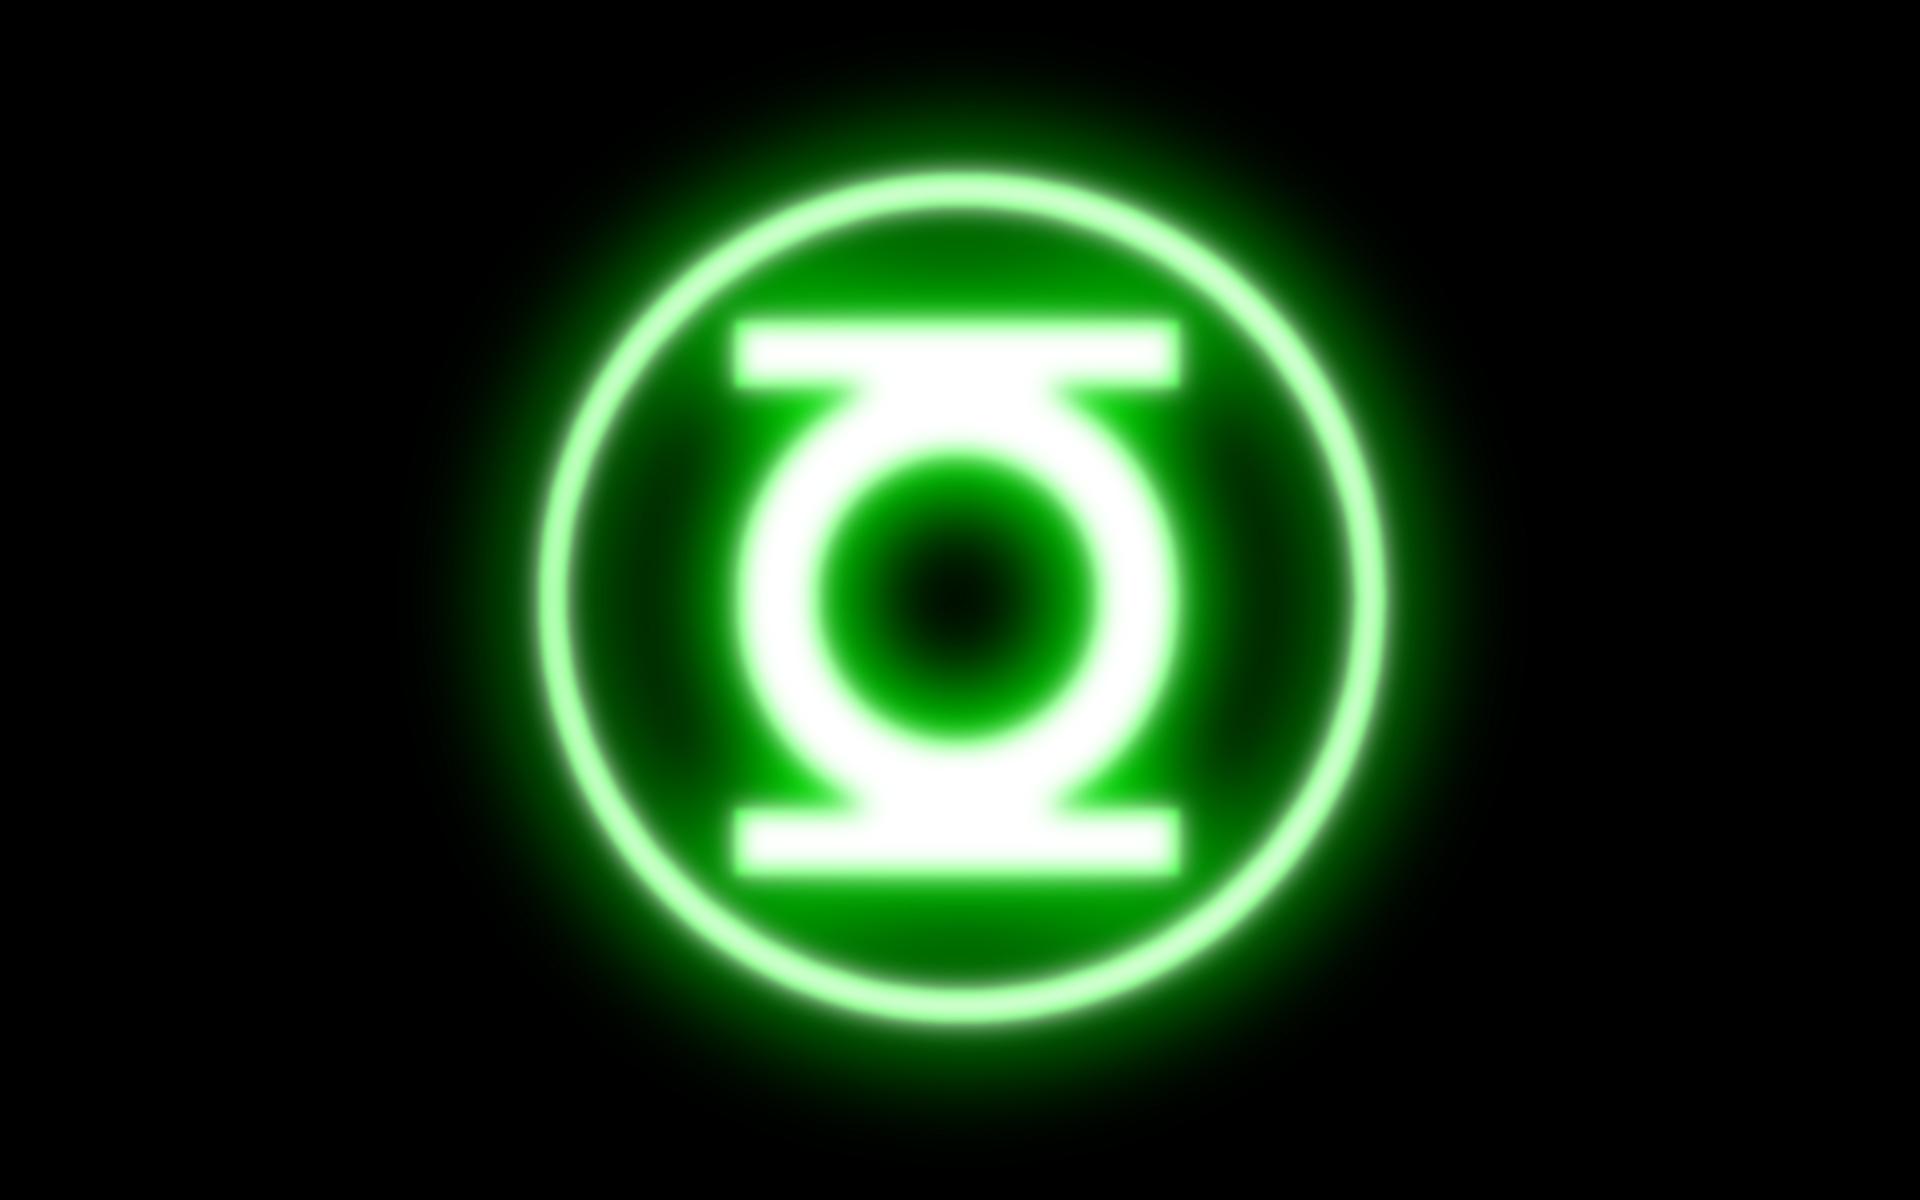 Green Lantern Logo Wallpaper Download Free Hd Wallpapers